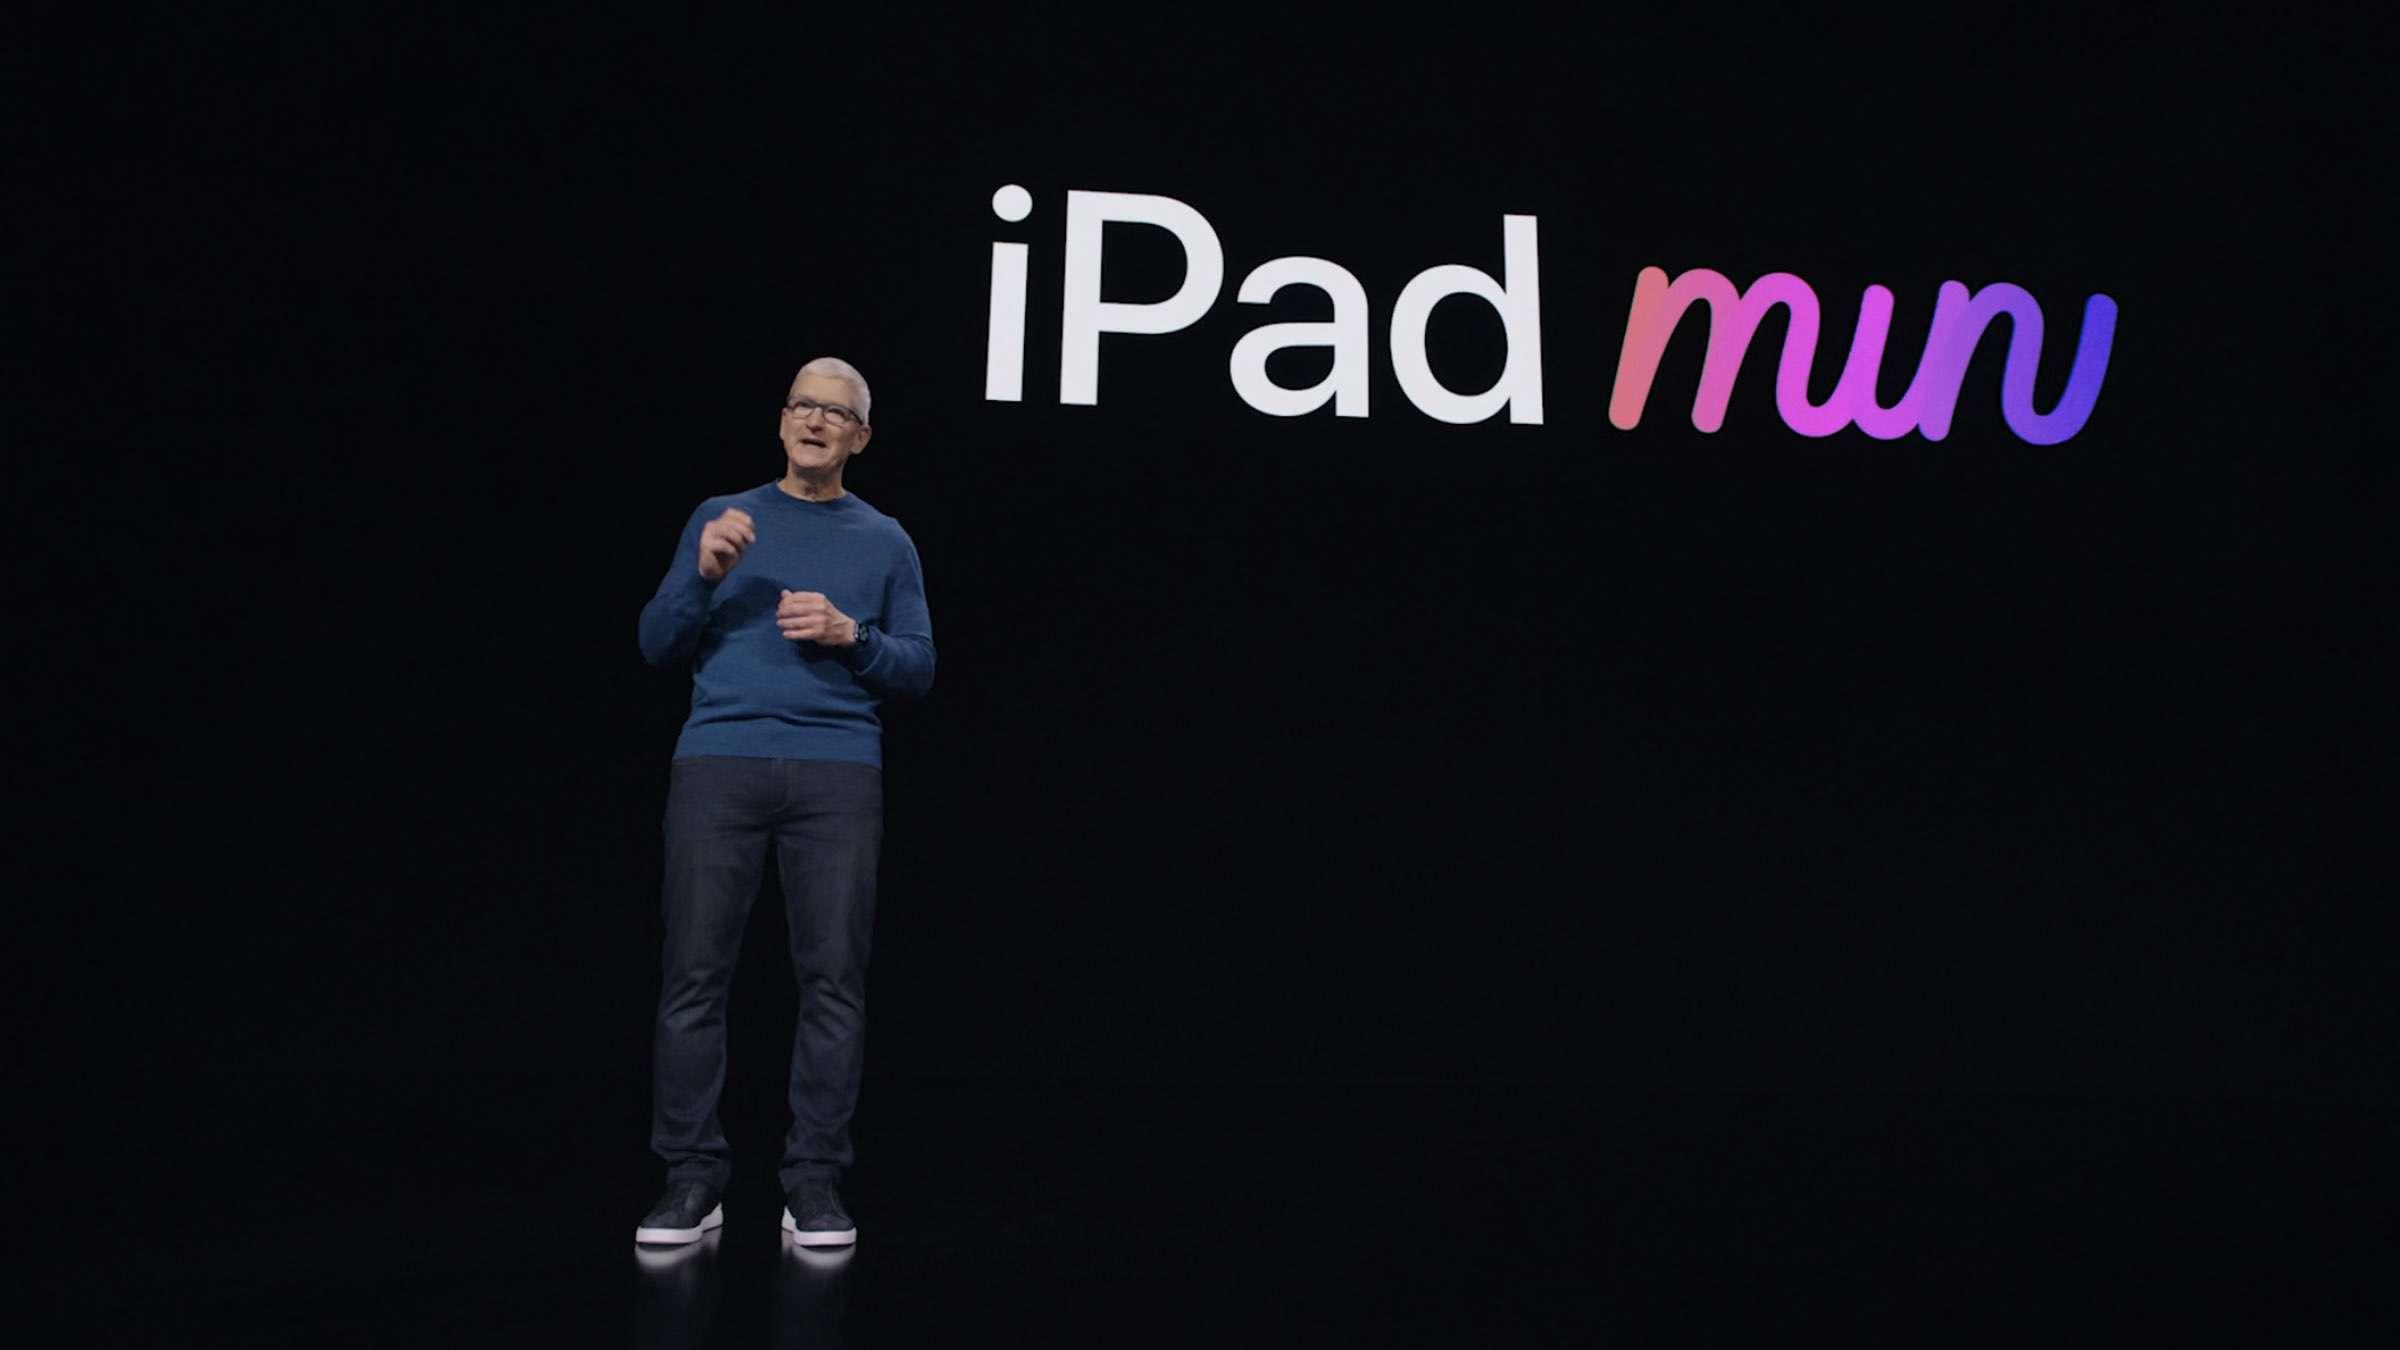 Das iPad mini